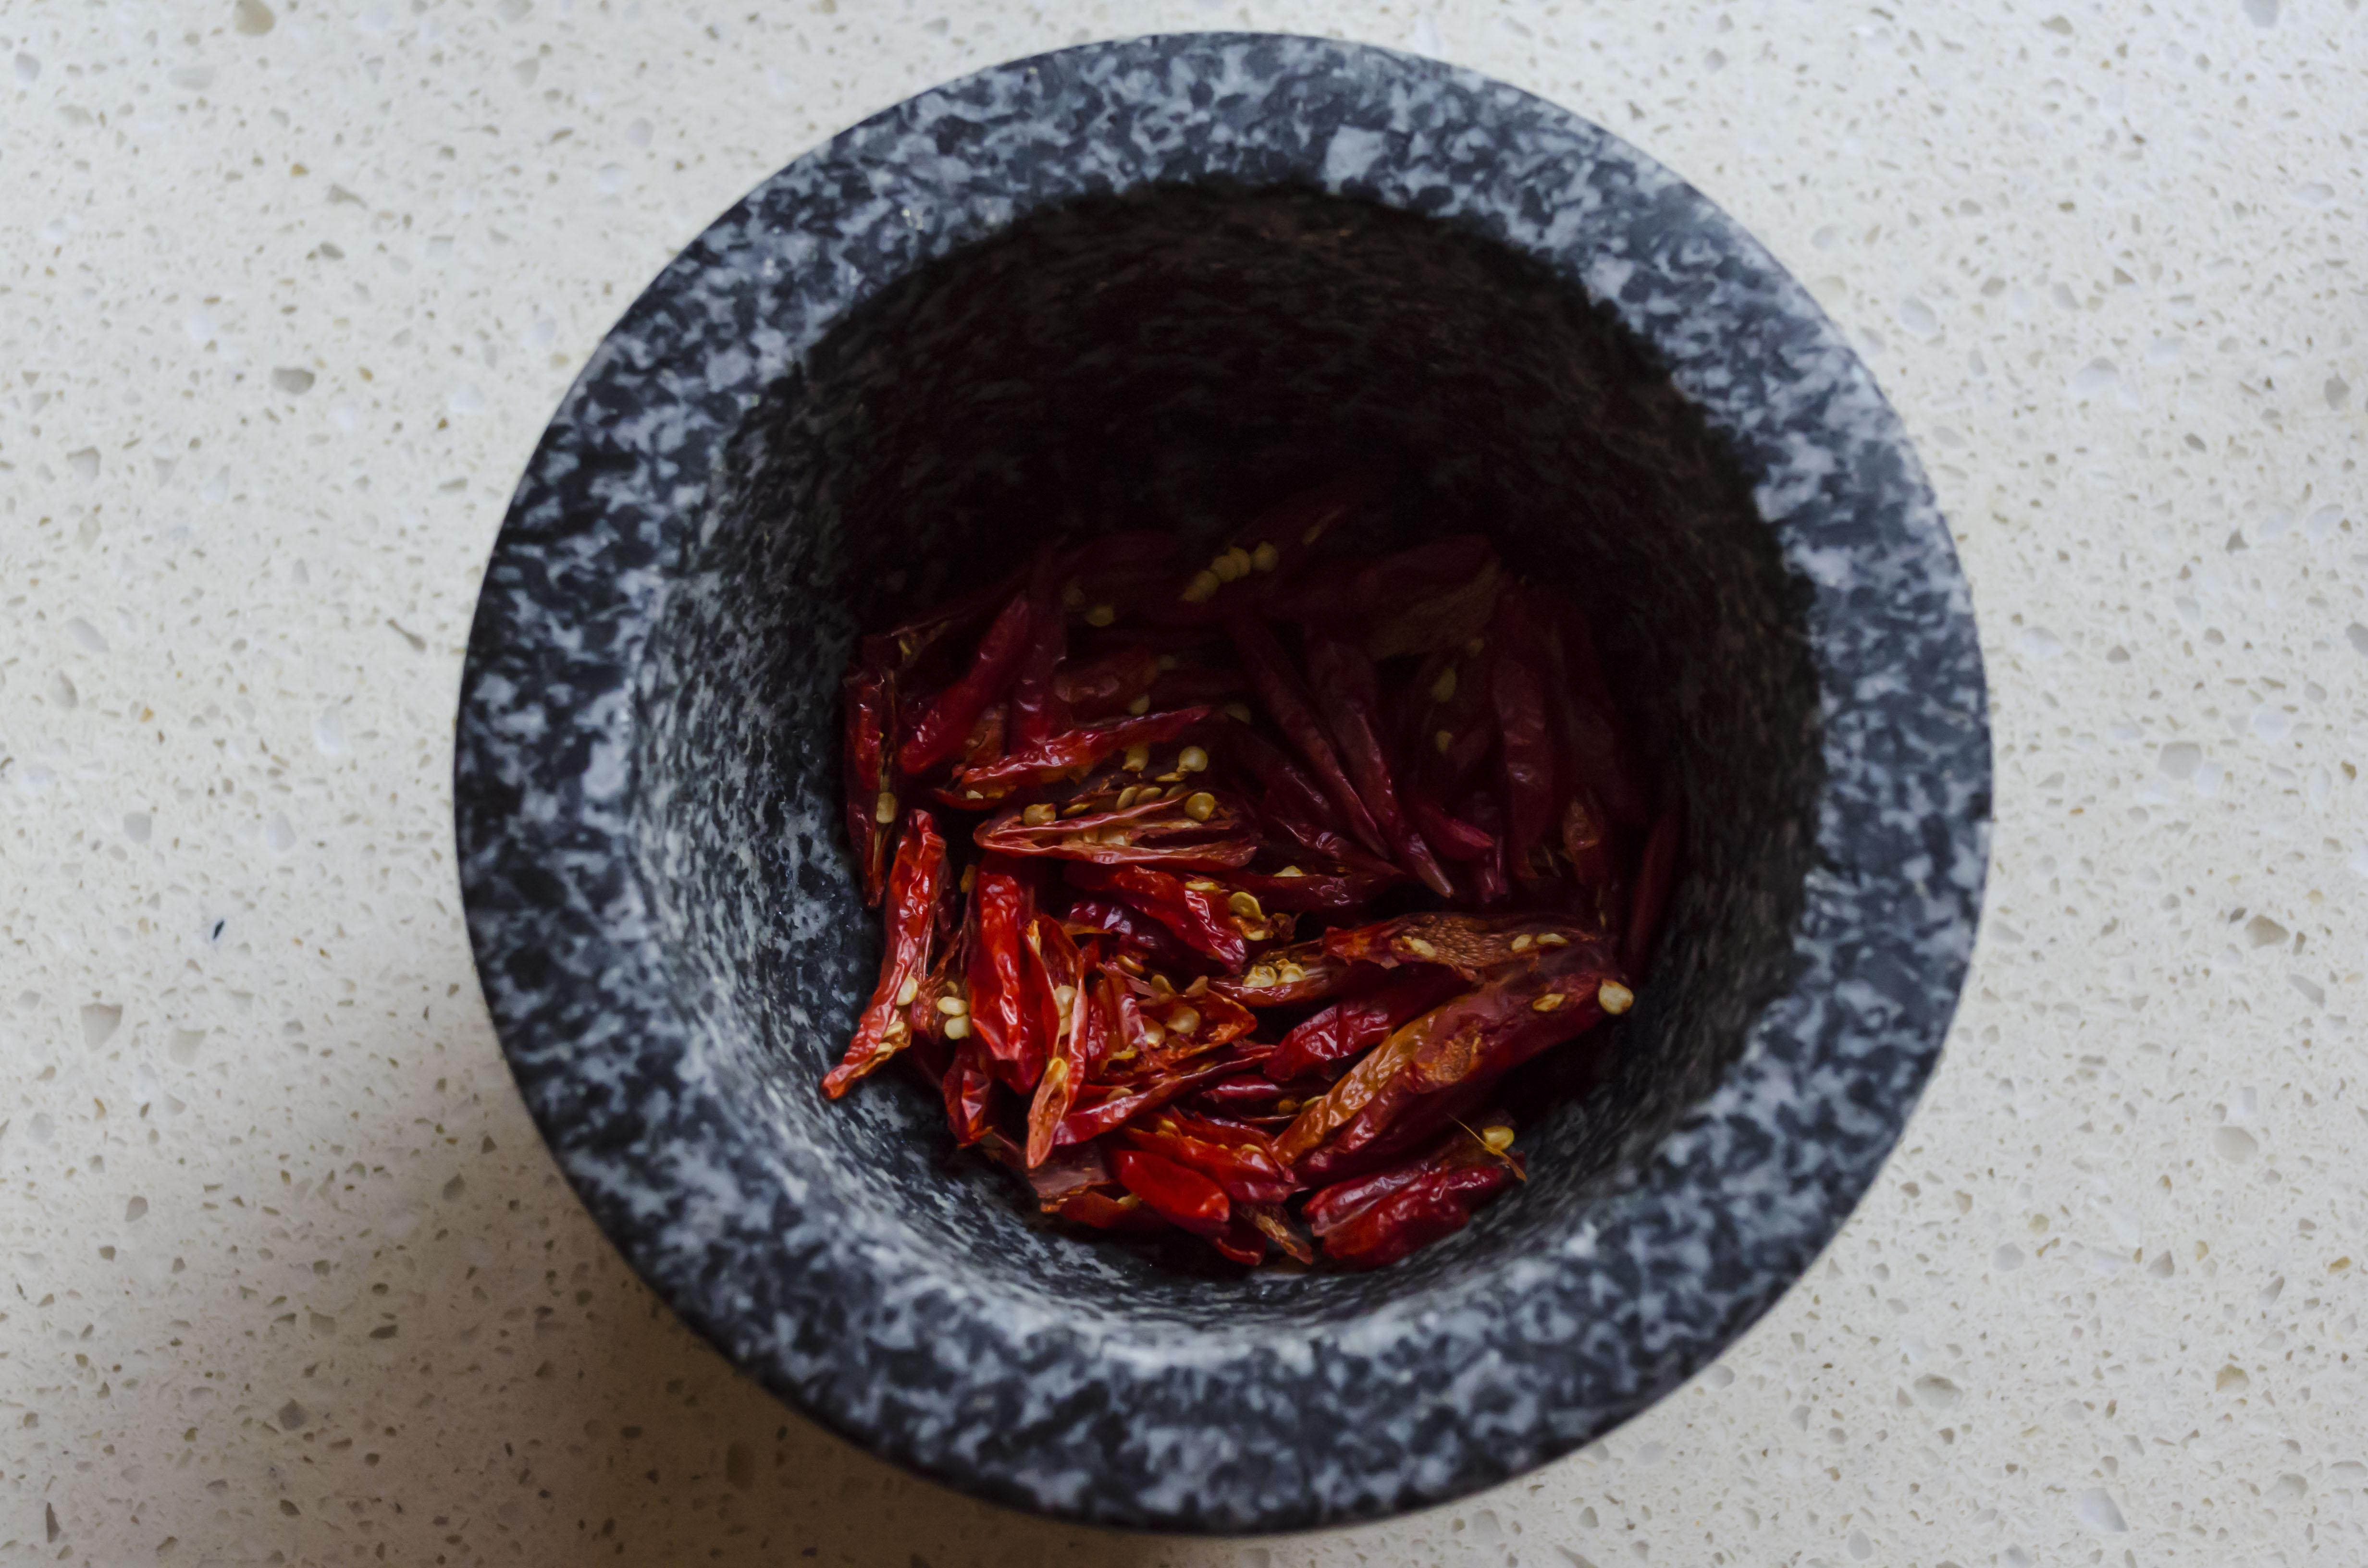 World's worst food blogger, chili salt, chili, chilli, mortar and pestle